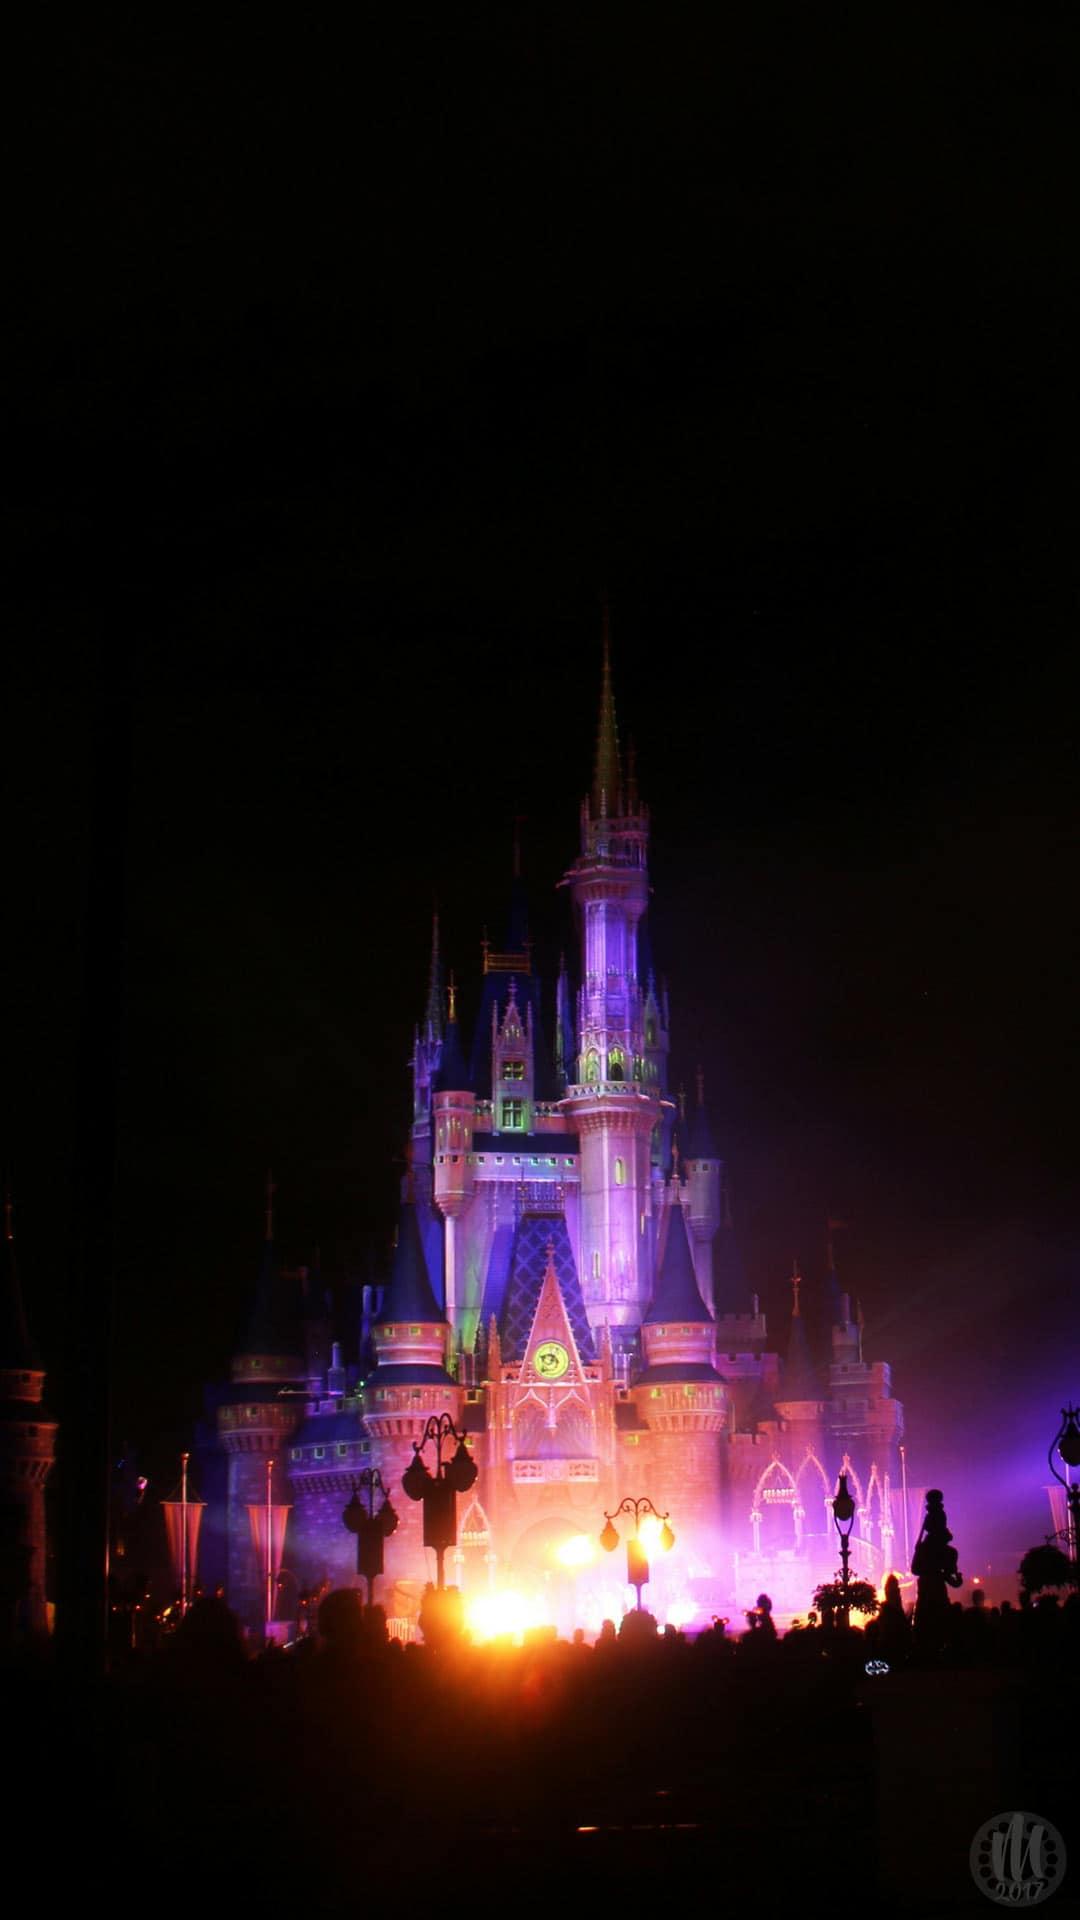 Disney Halloween Iphone Wallpapers From Magic Kingdom